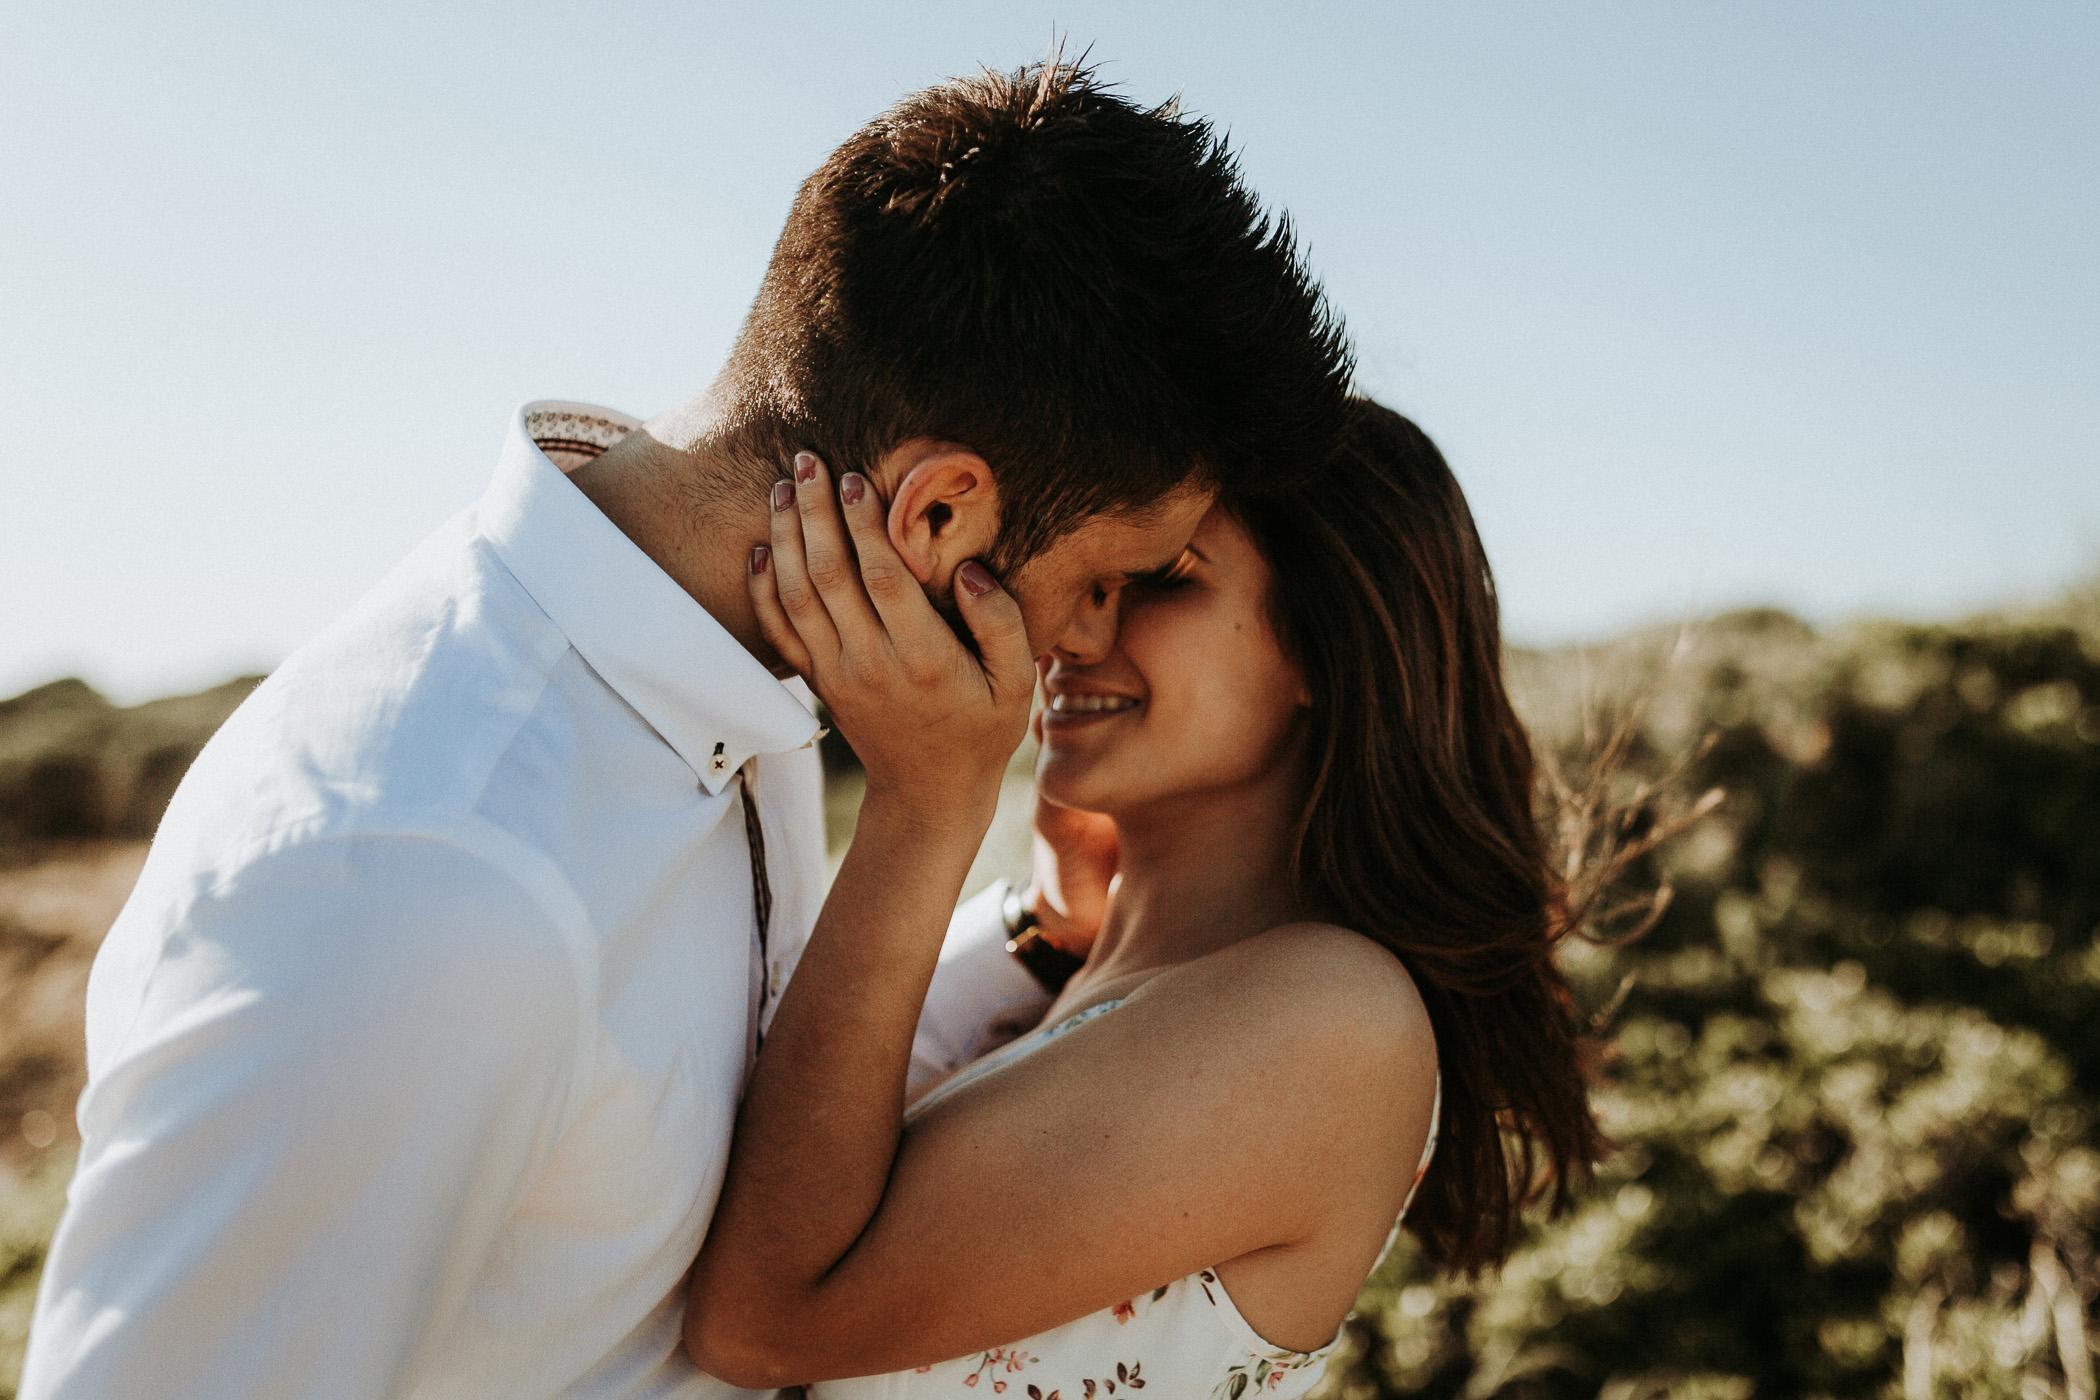 DanielaMarquardtPhotography_wedding_elopement_mallorca_spain_calapi_palma_lauraandtoni_287